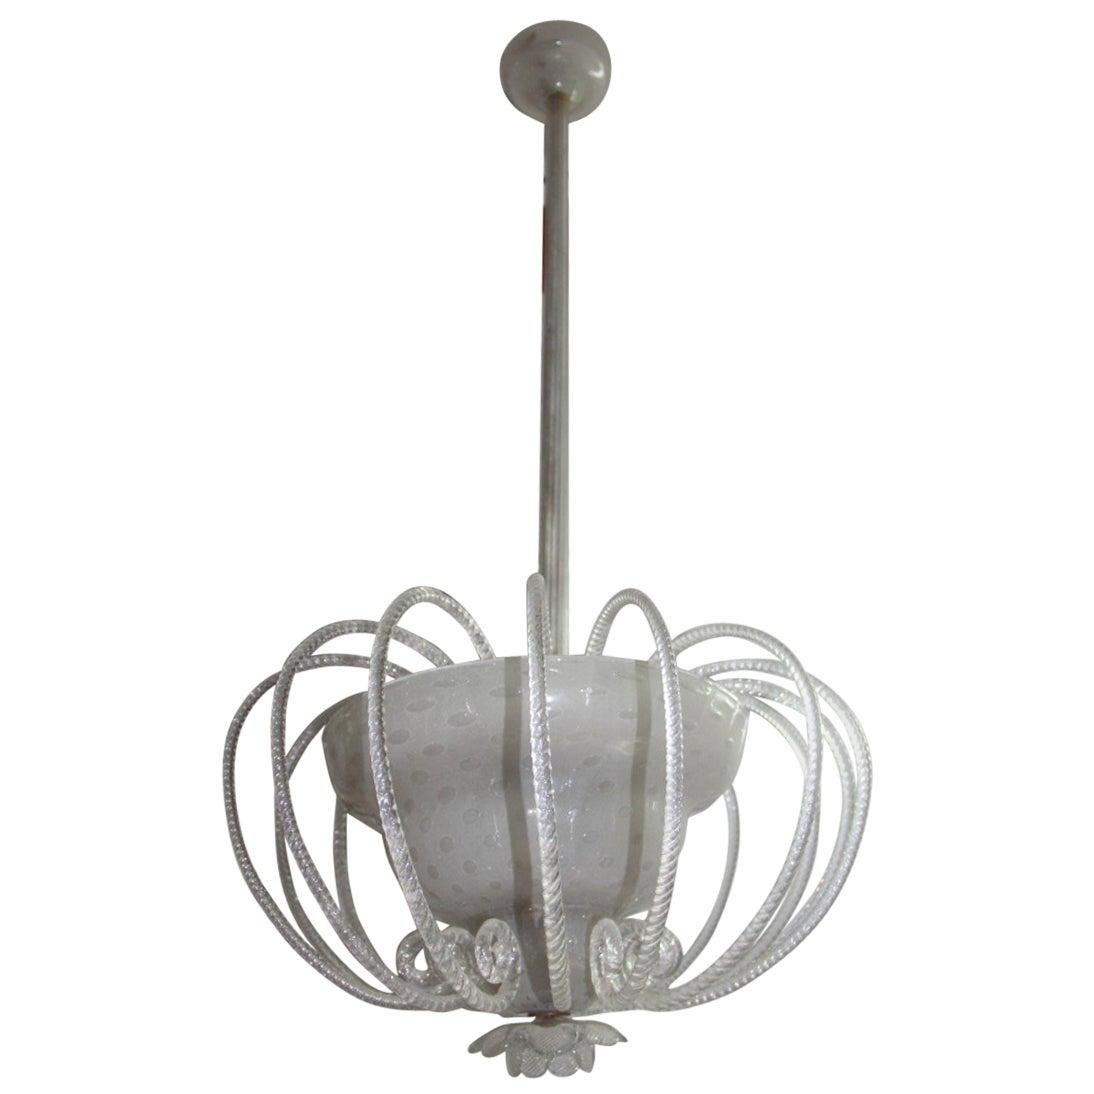 Chandelier Murano Glass, Italian Design 1940s